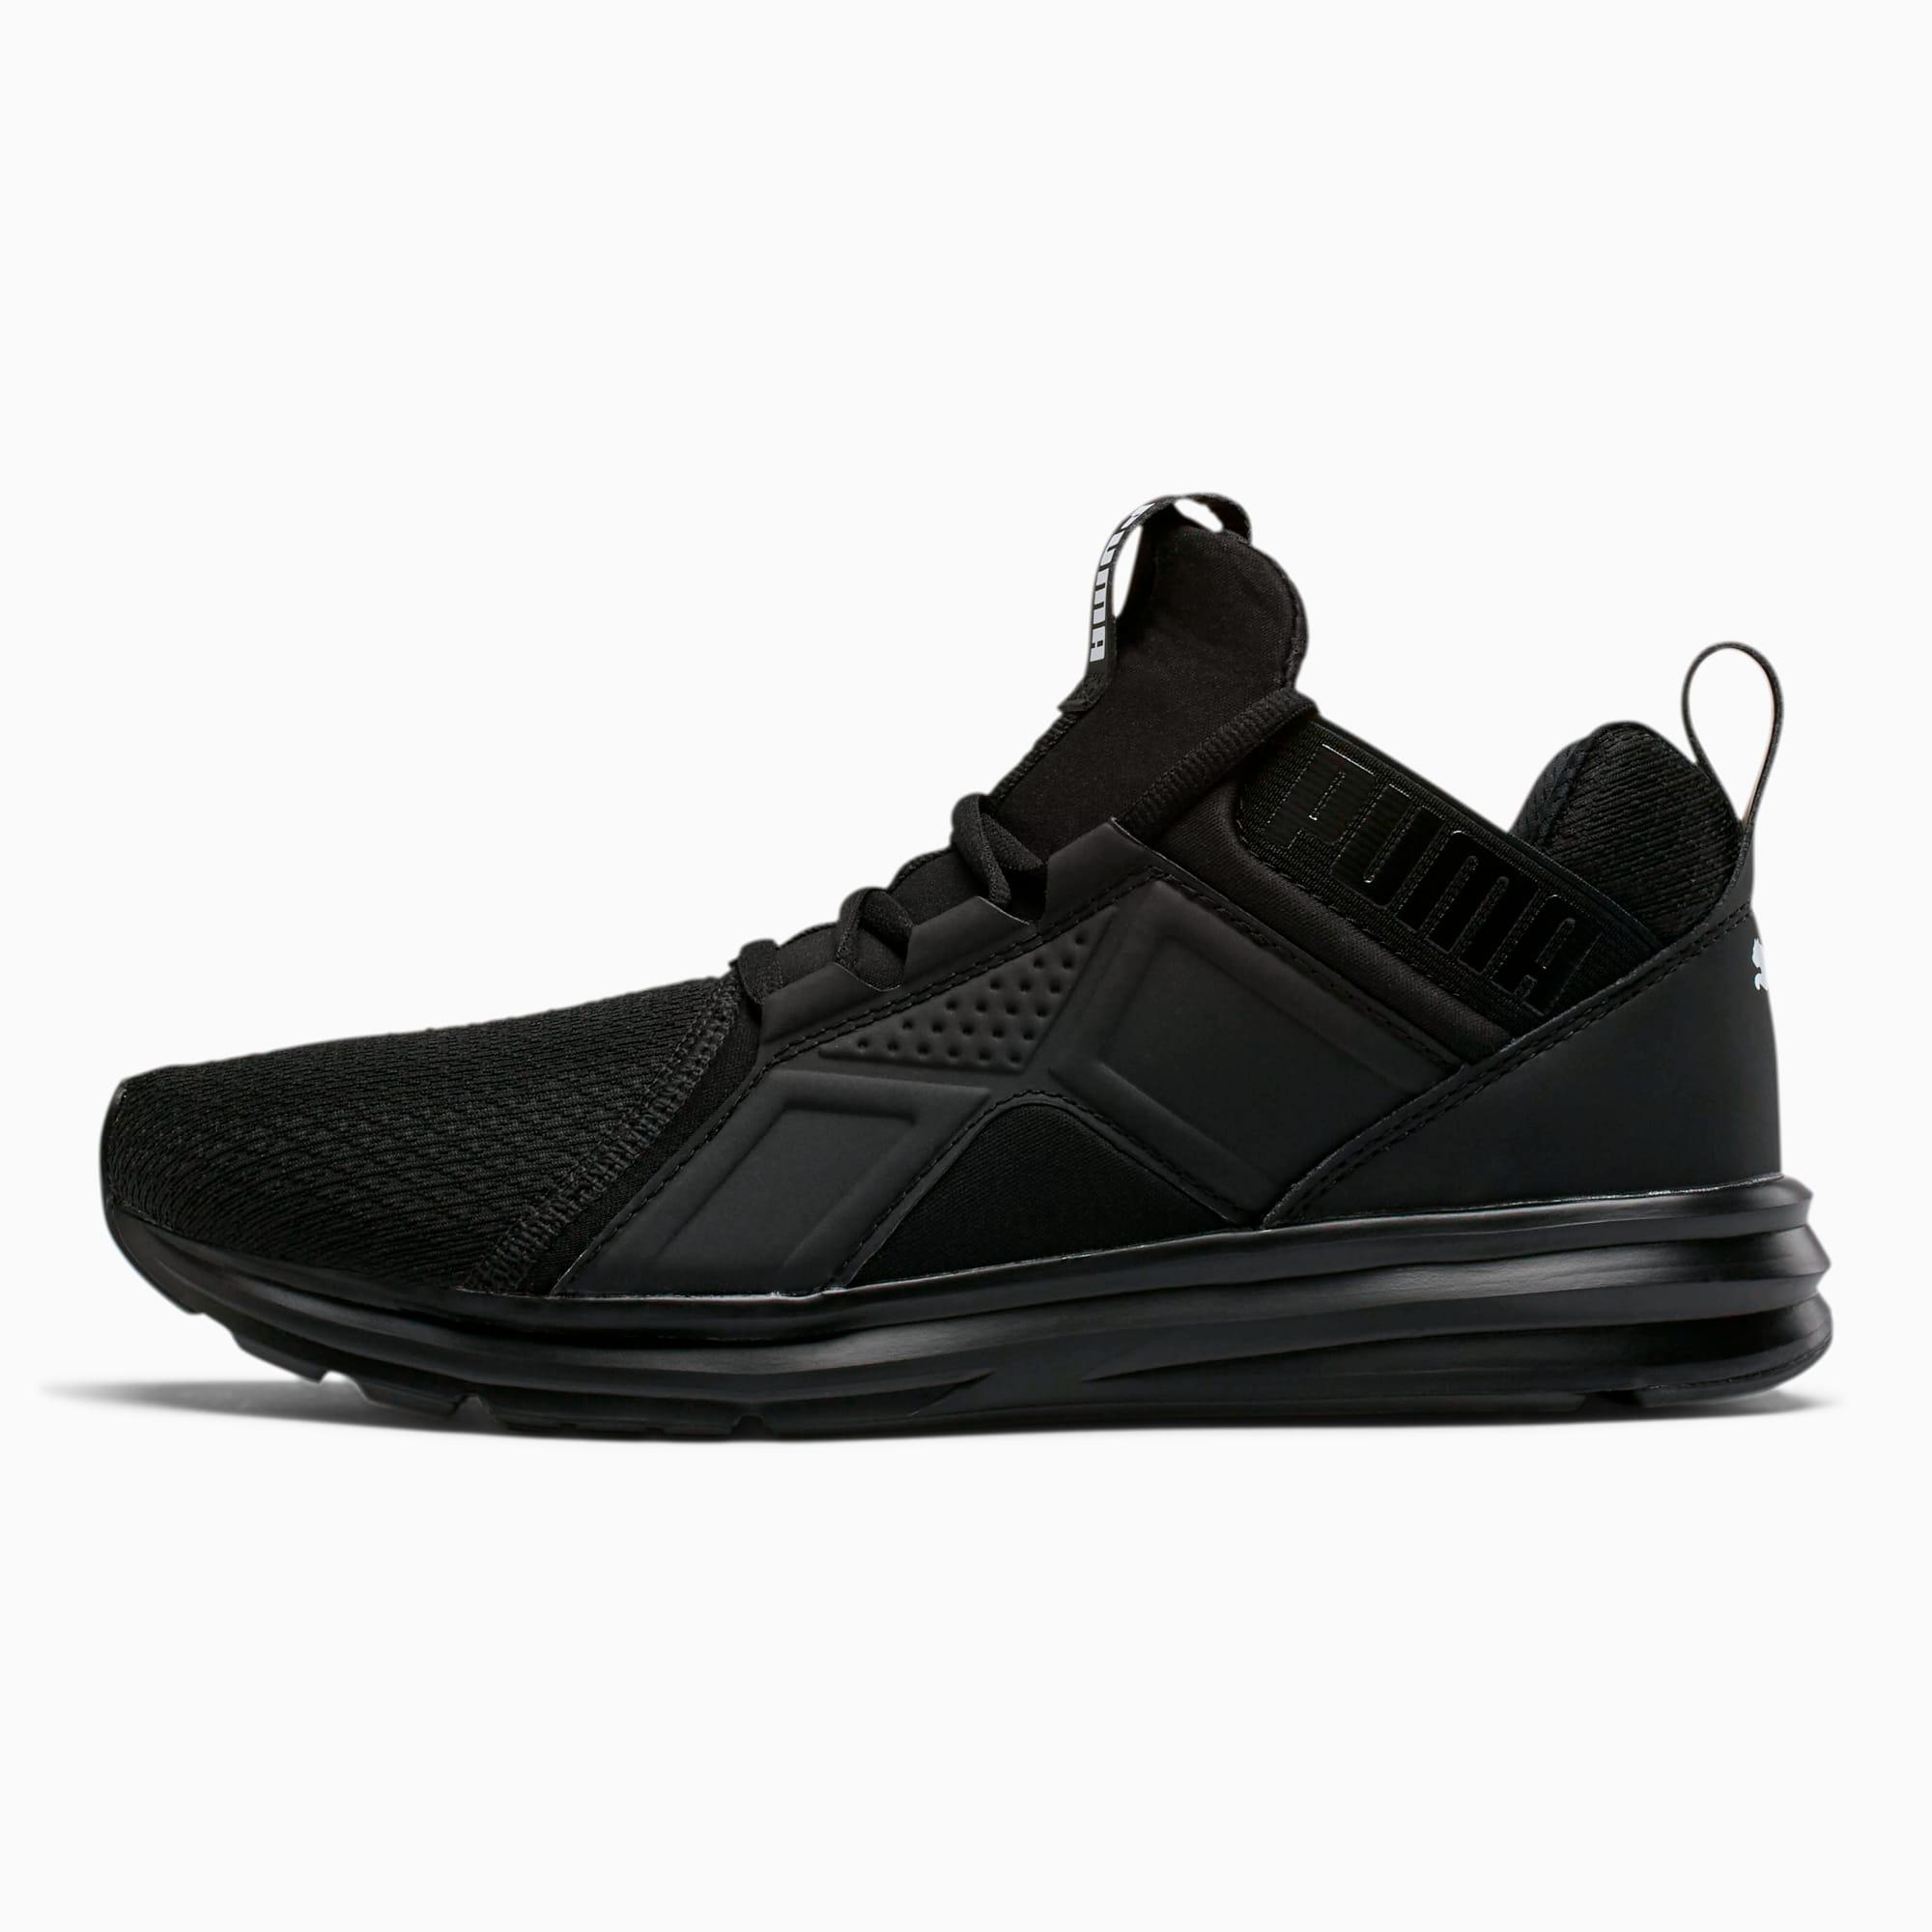 Enzo Men's Training Shoes